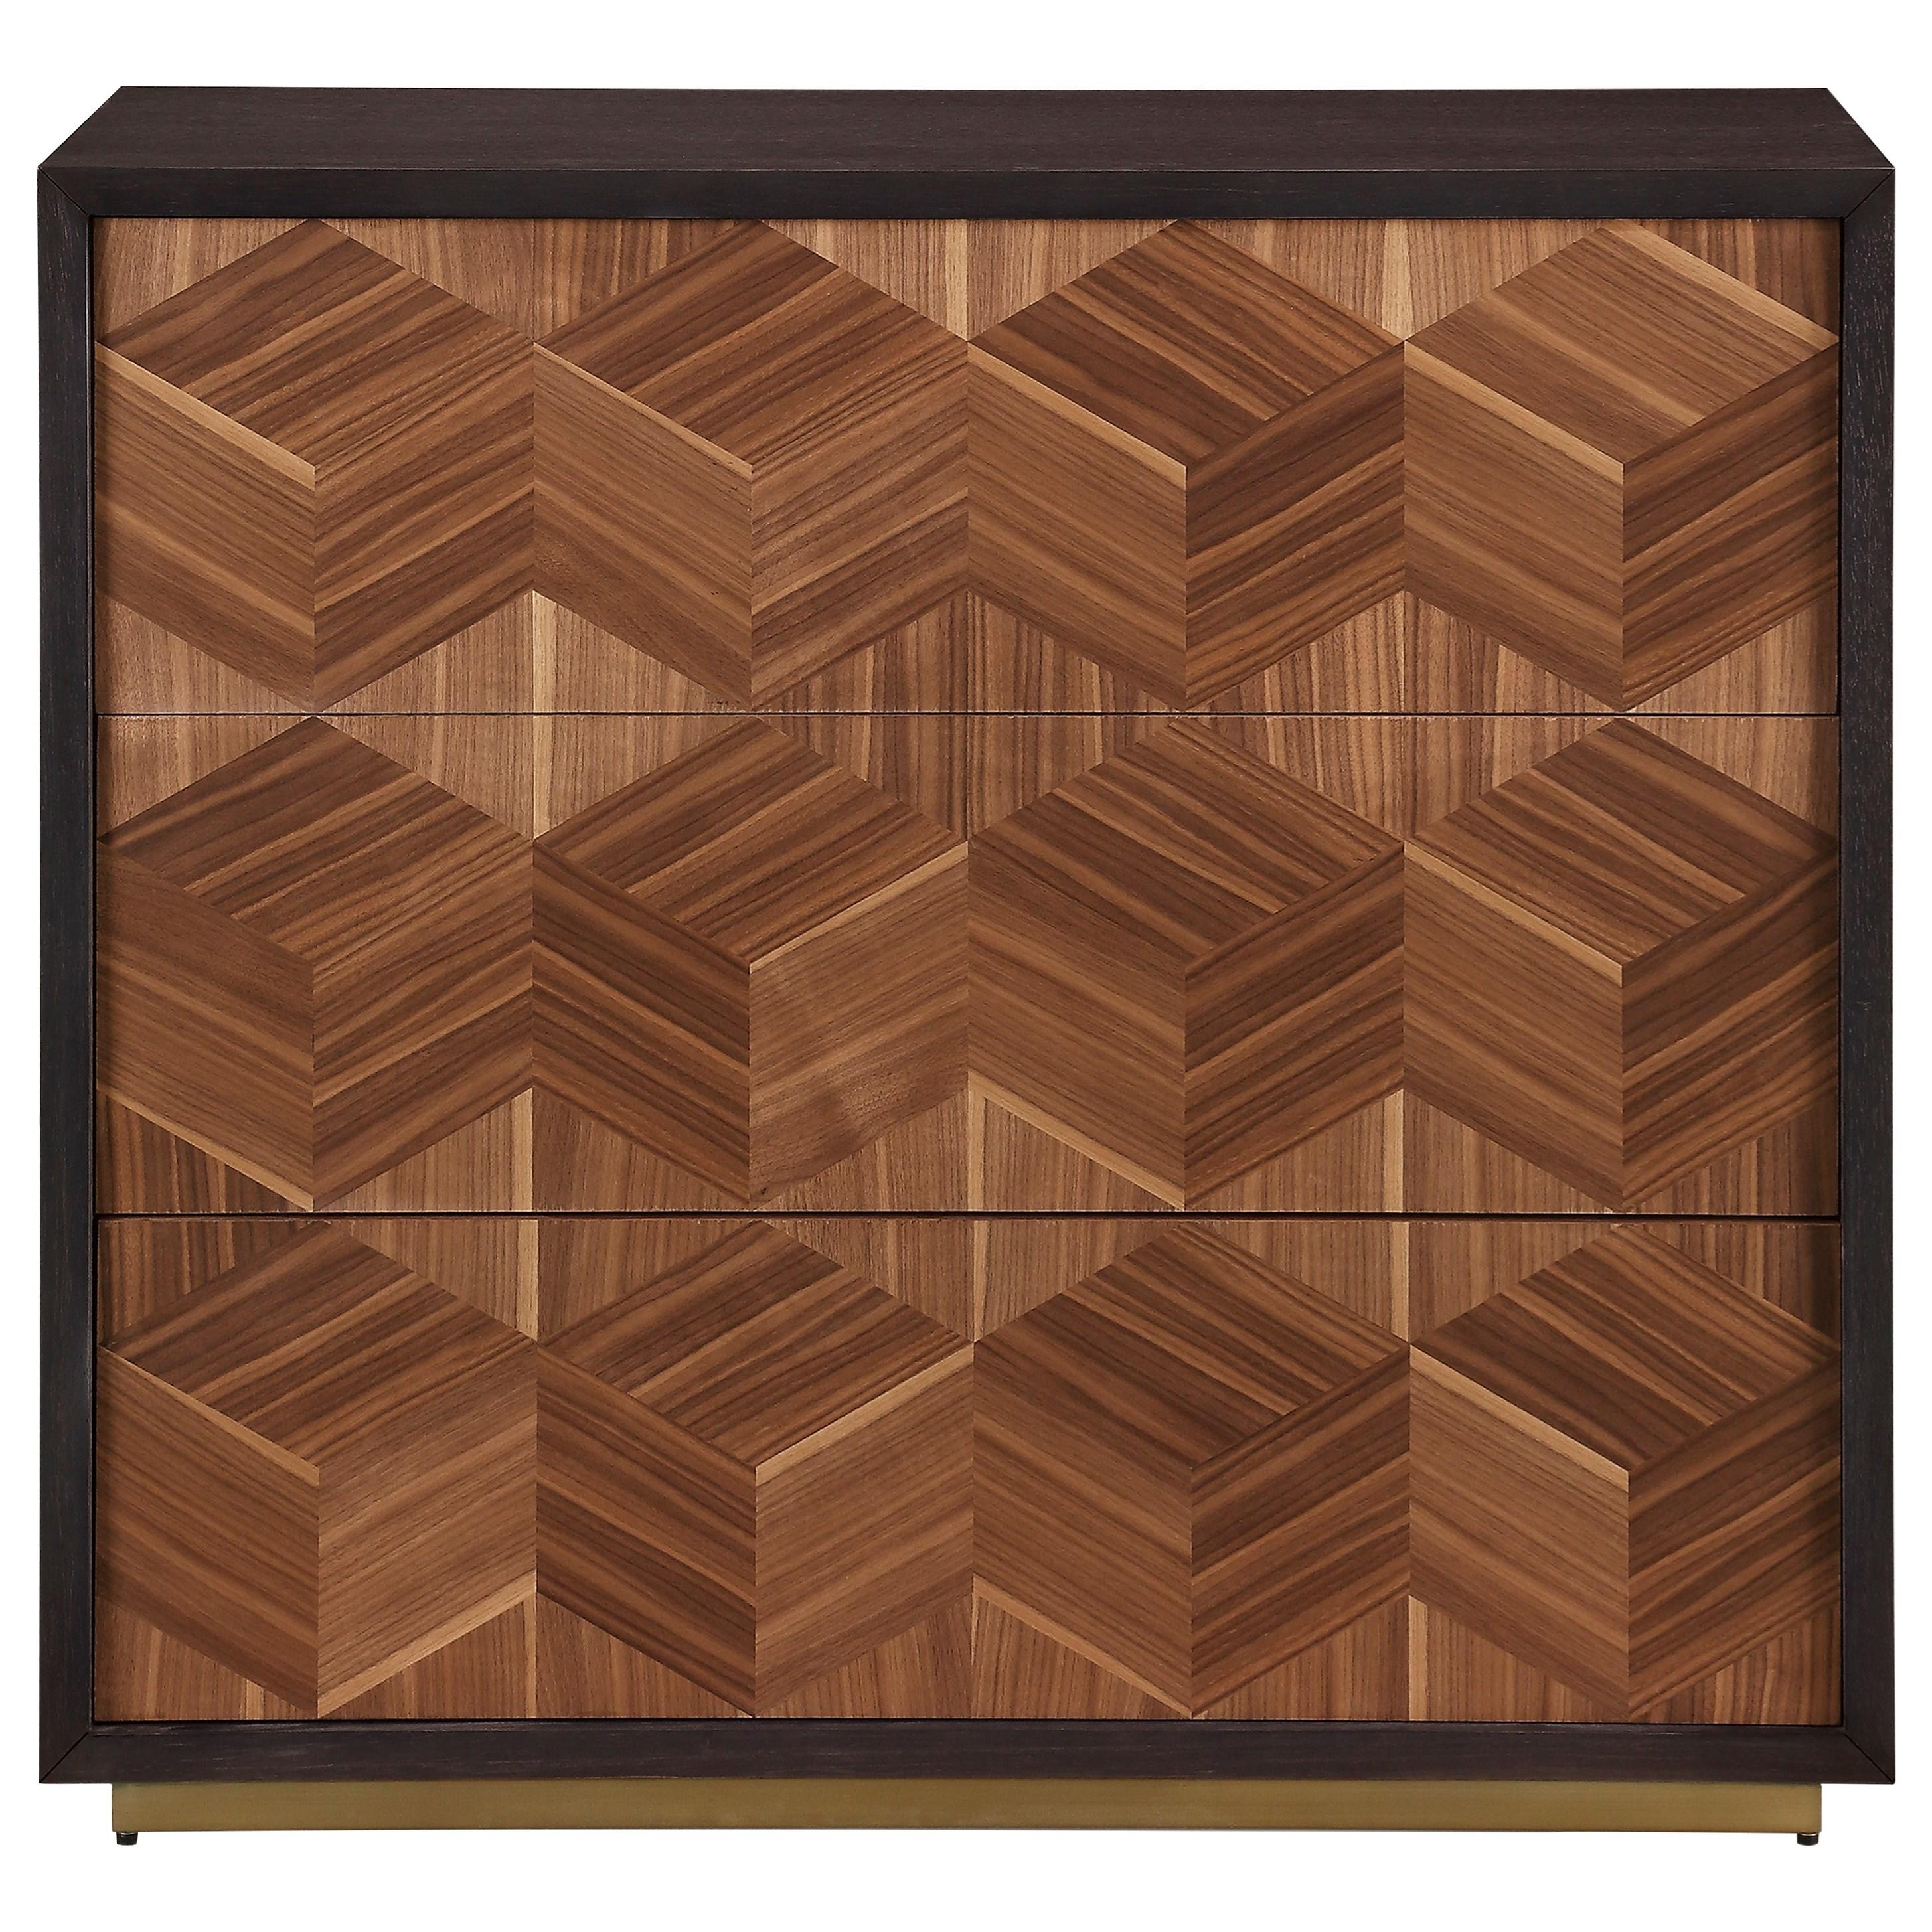 Bobby Berk Brekke Drawer Chest by A.R.T. Furniture Inc at Dream Home Interiors